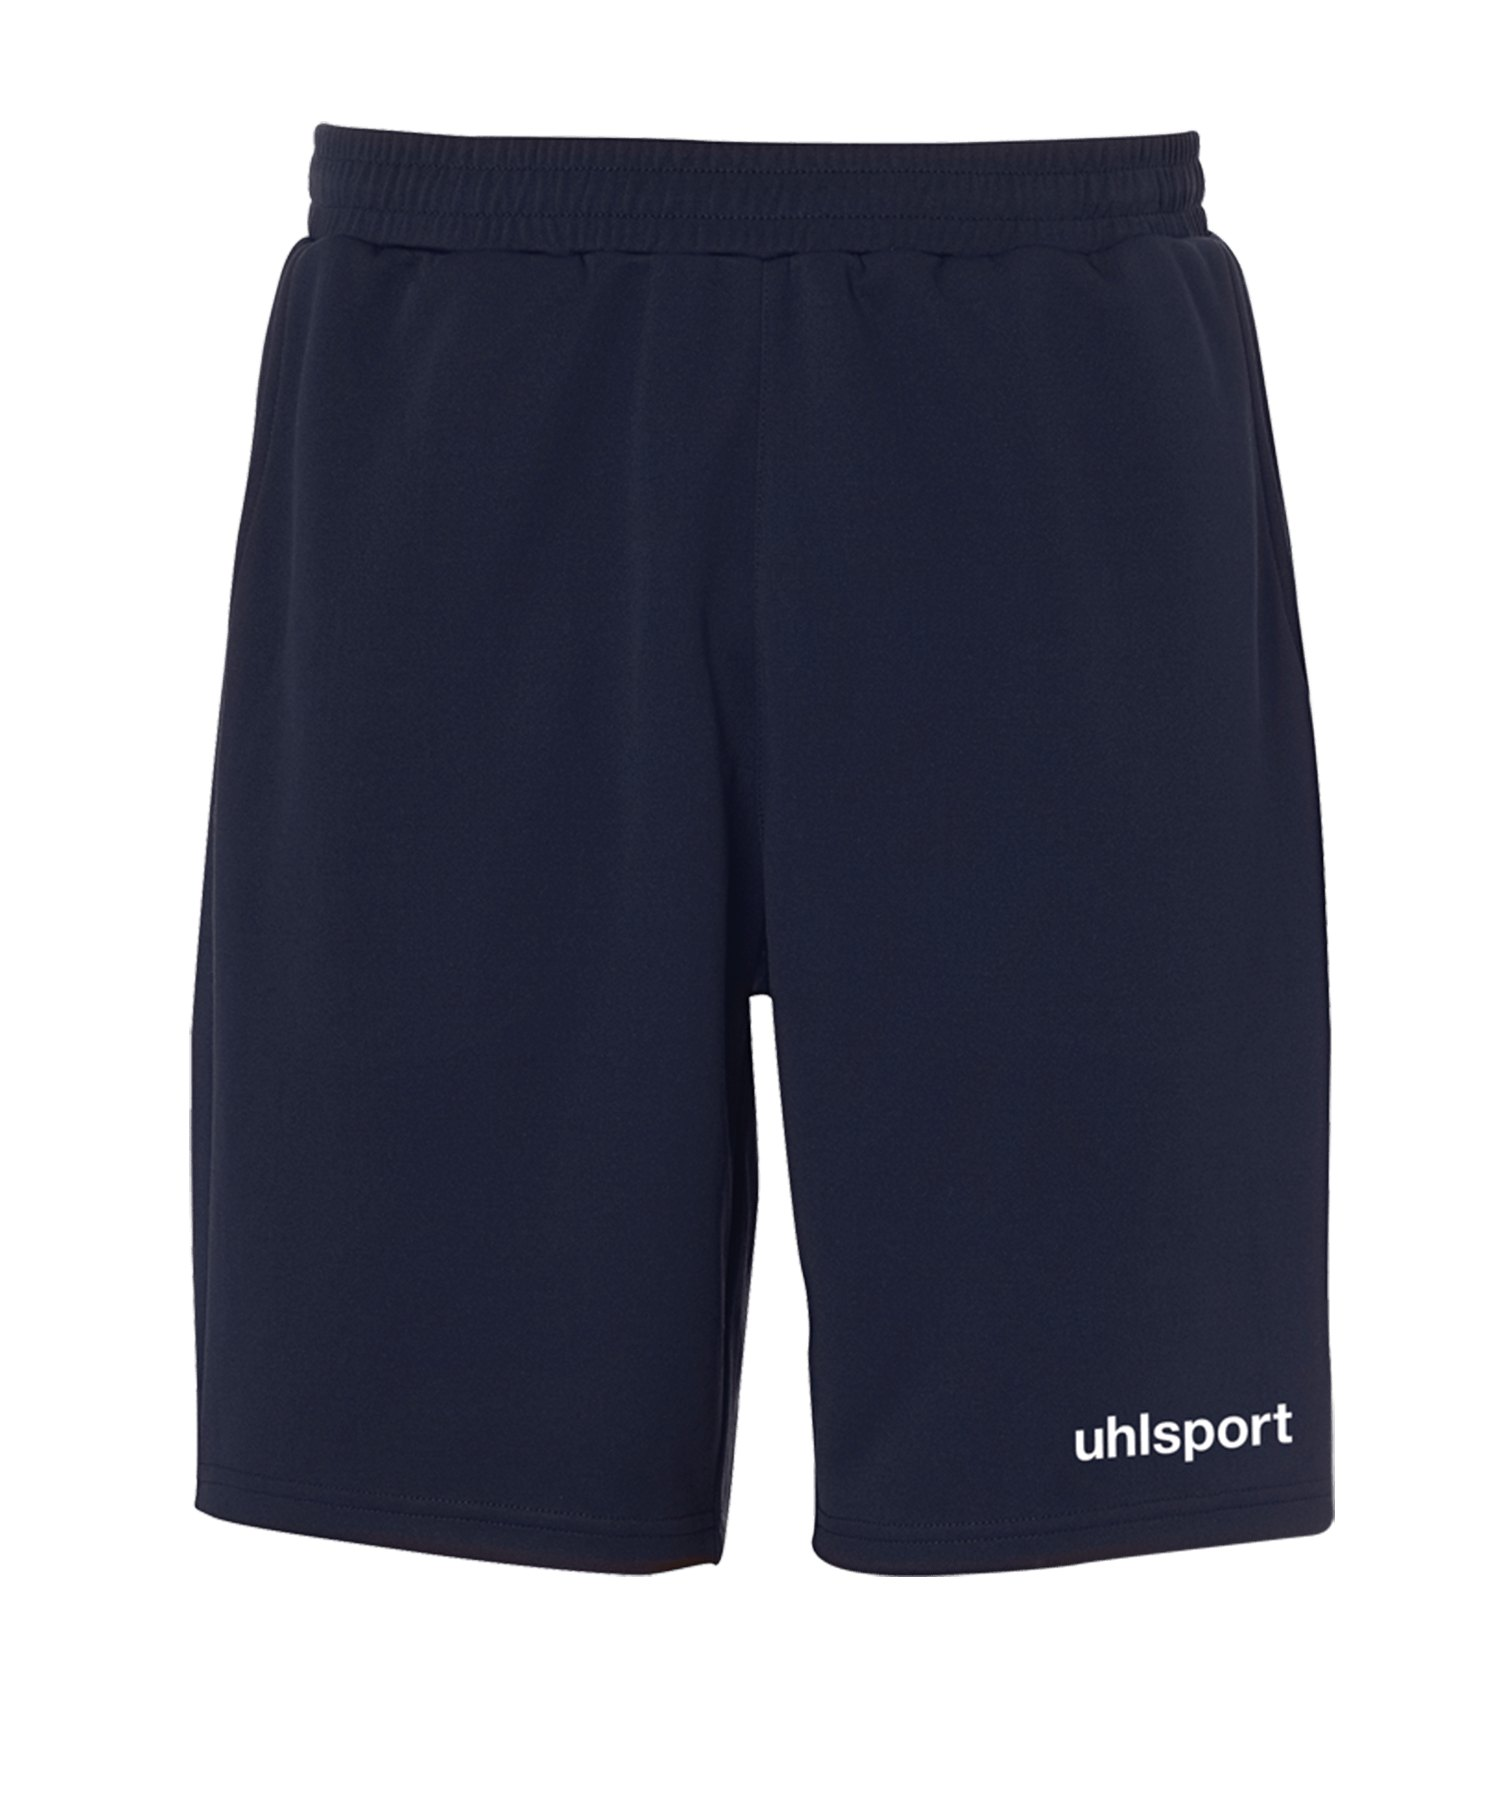 Uhlsport Essential PES-Short Hose kurz Blau F12 - blau